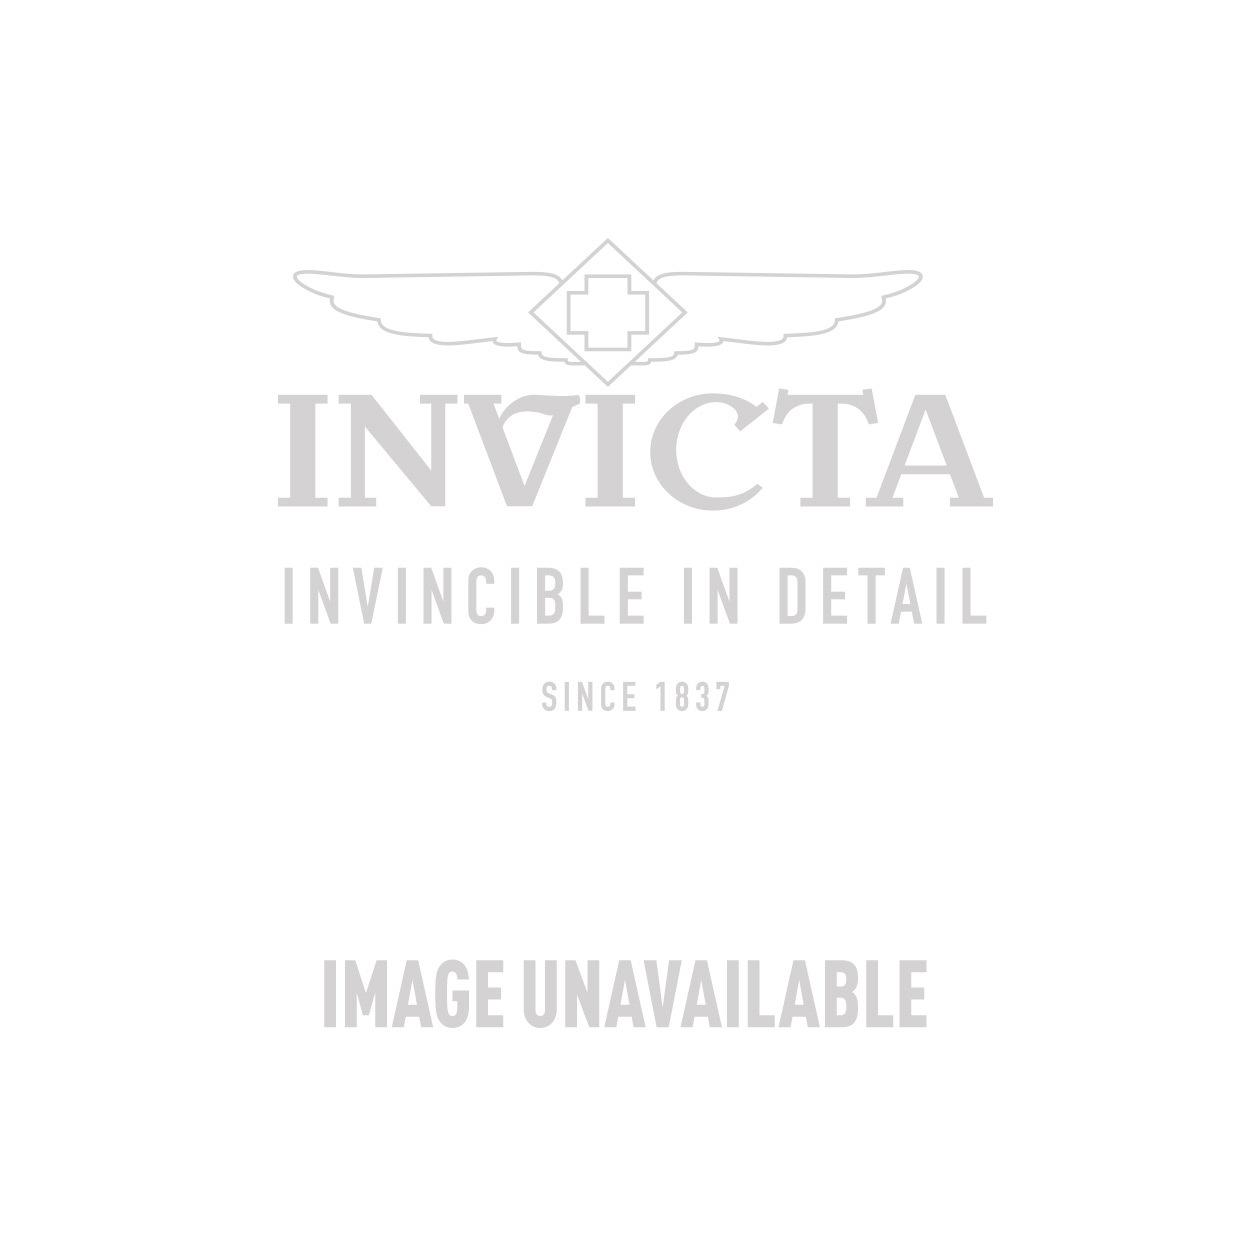 Invicta Reserve Swiss Made Quartz Watch - Dark Grey case with Dark Grey tone Polyurethane band - Model 17292